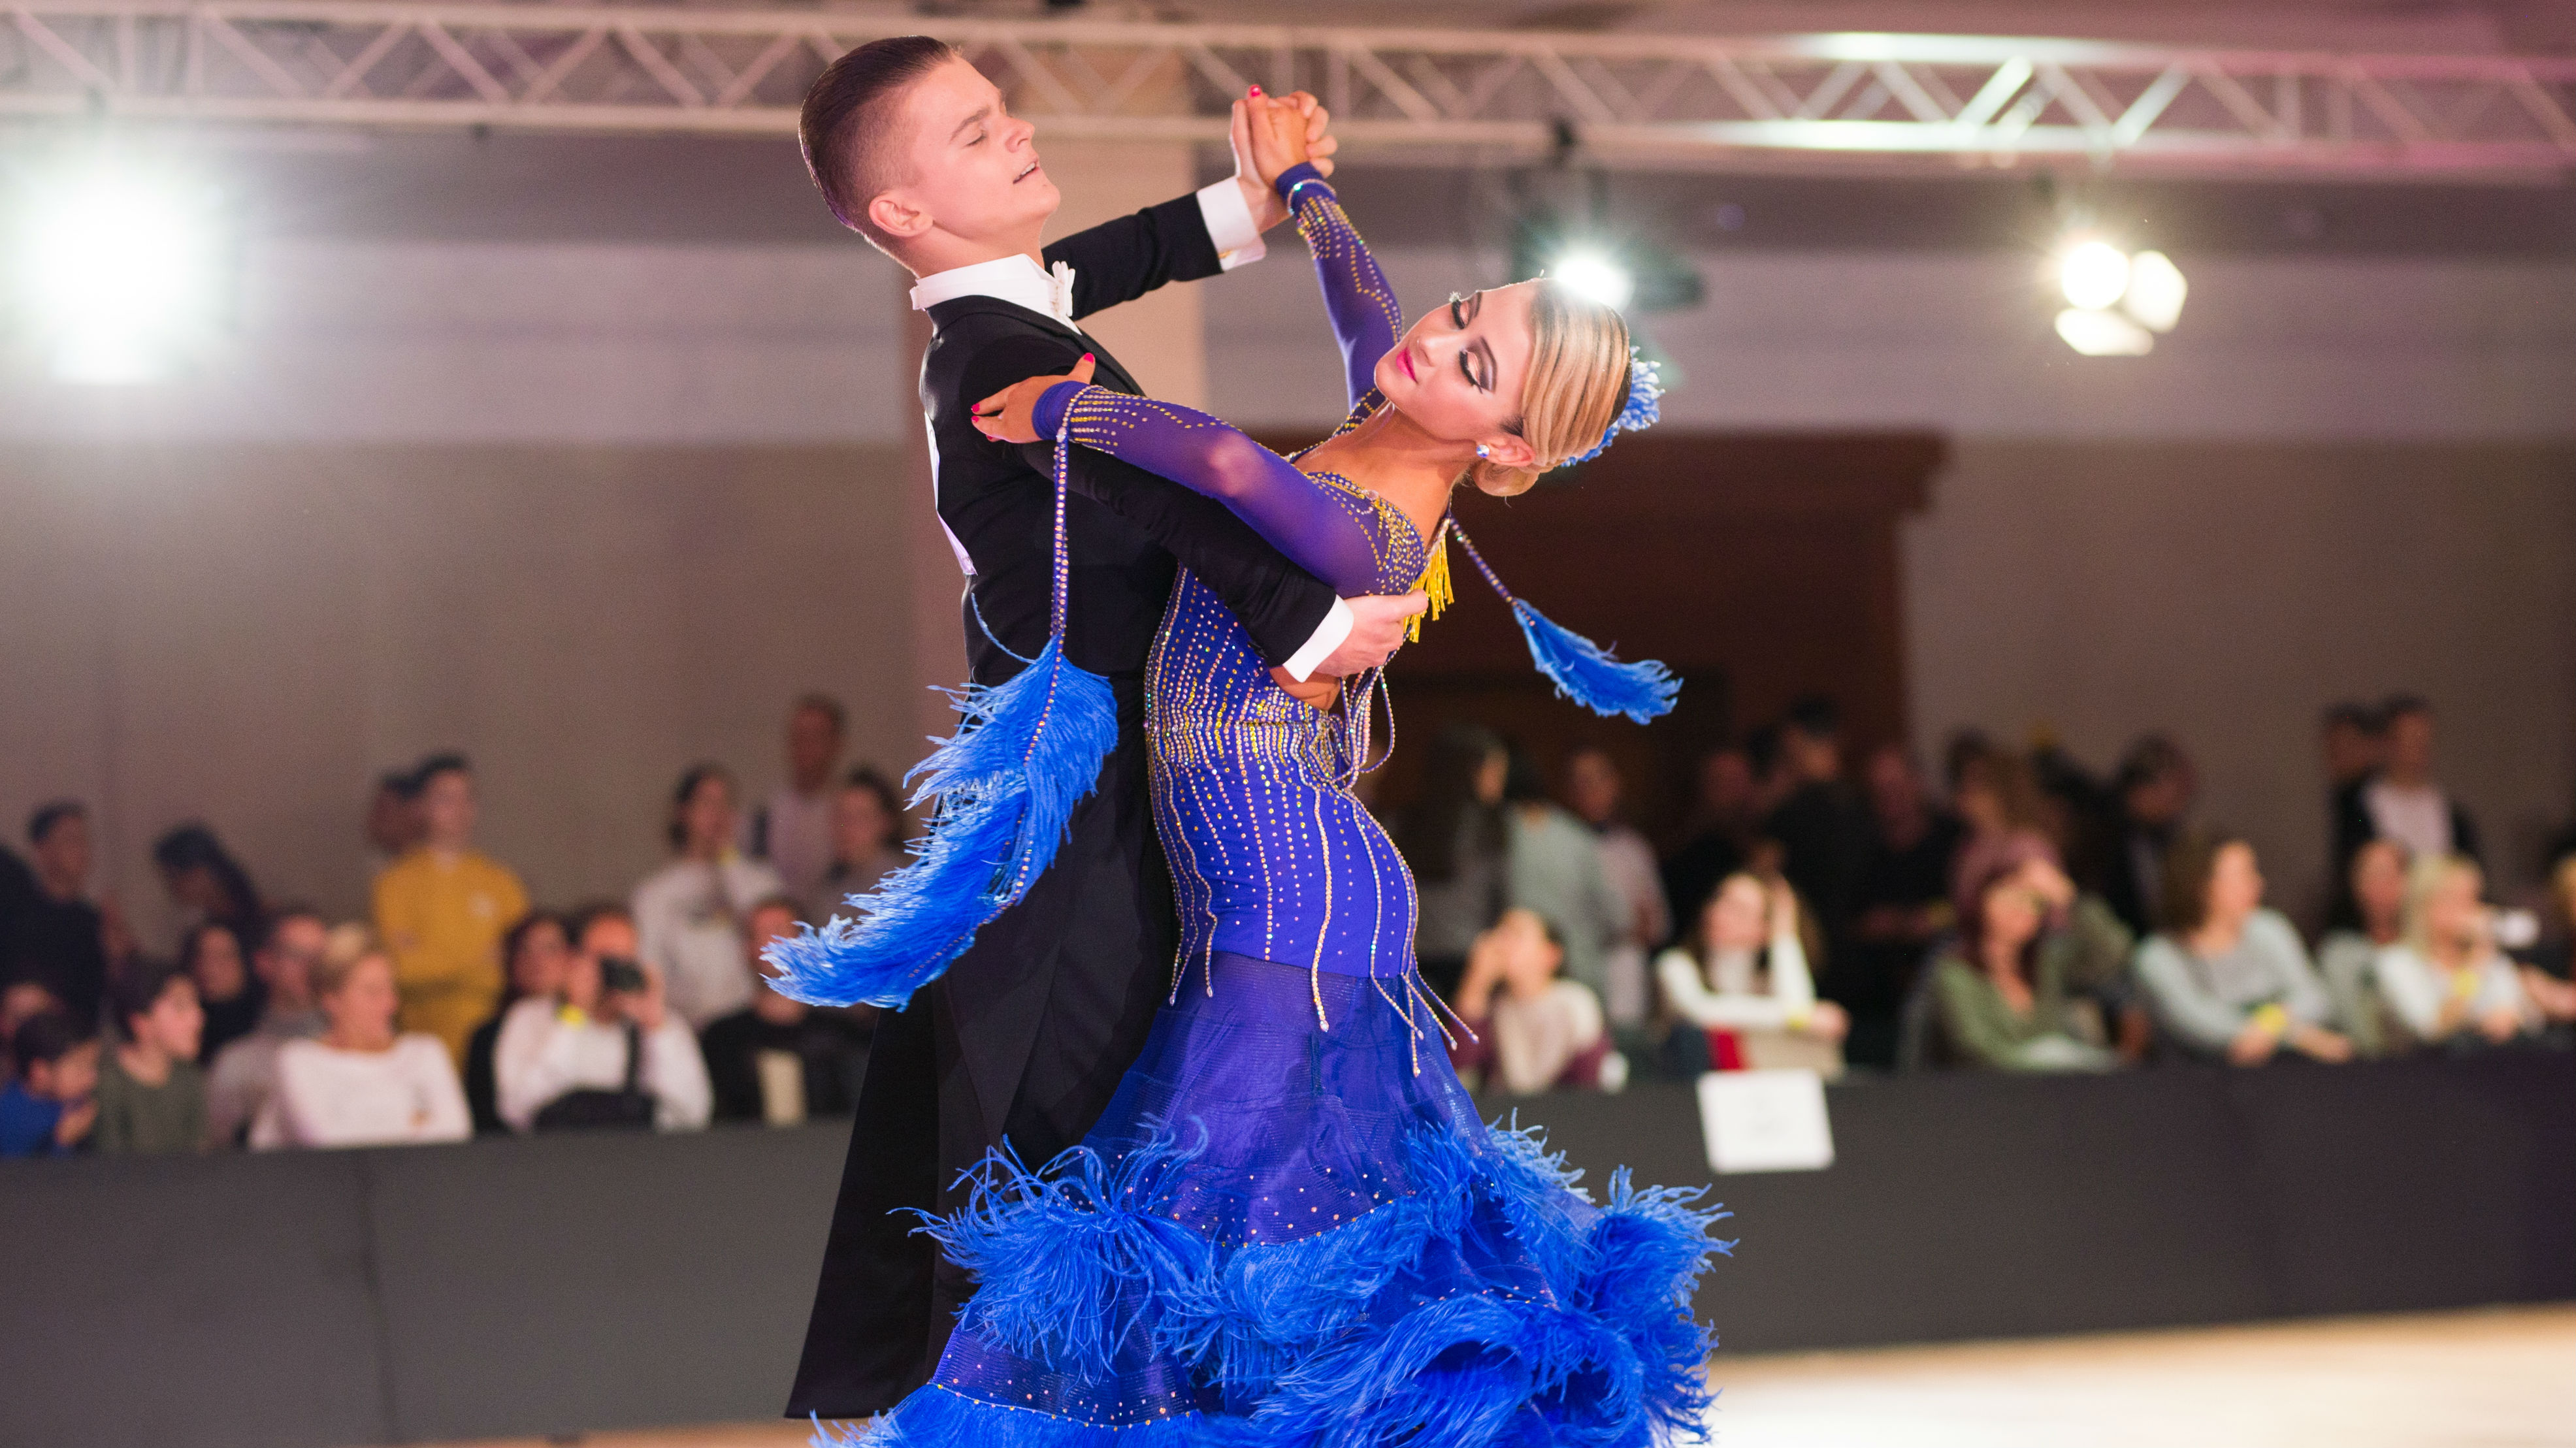 Campeonato de España Standard de Baile Deportivo. Febrero 2019